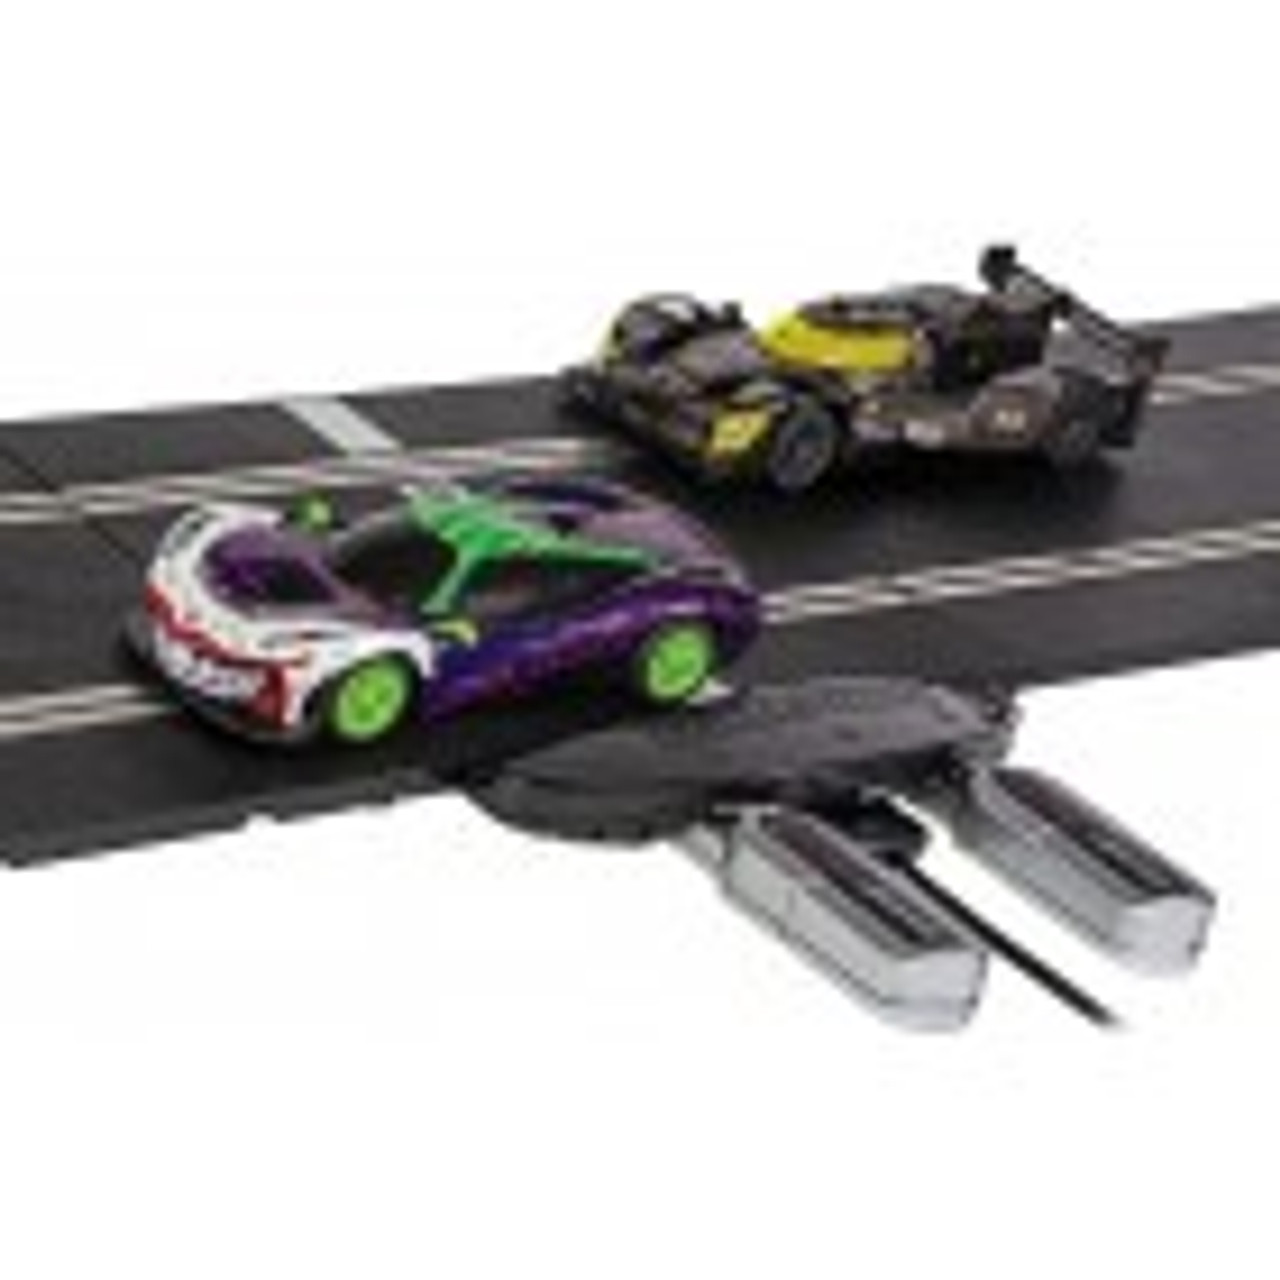 SCALEXTRIC BATMAN VS JOKER RACE SET